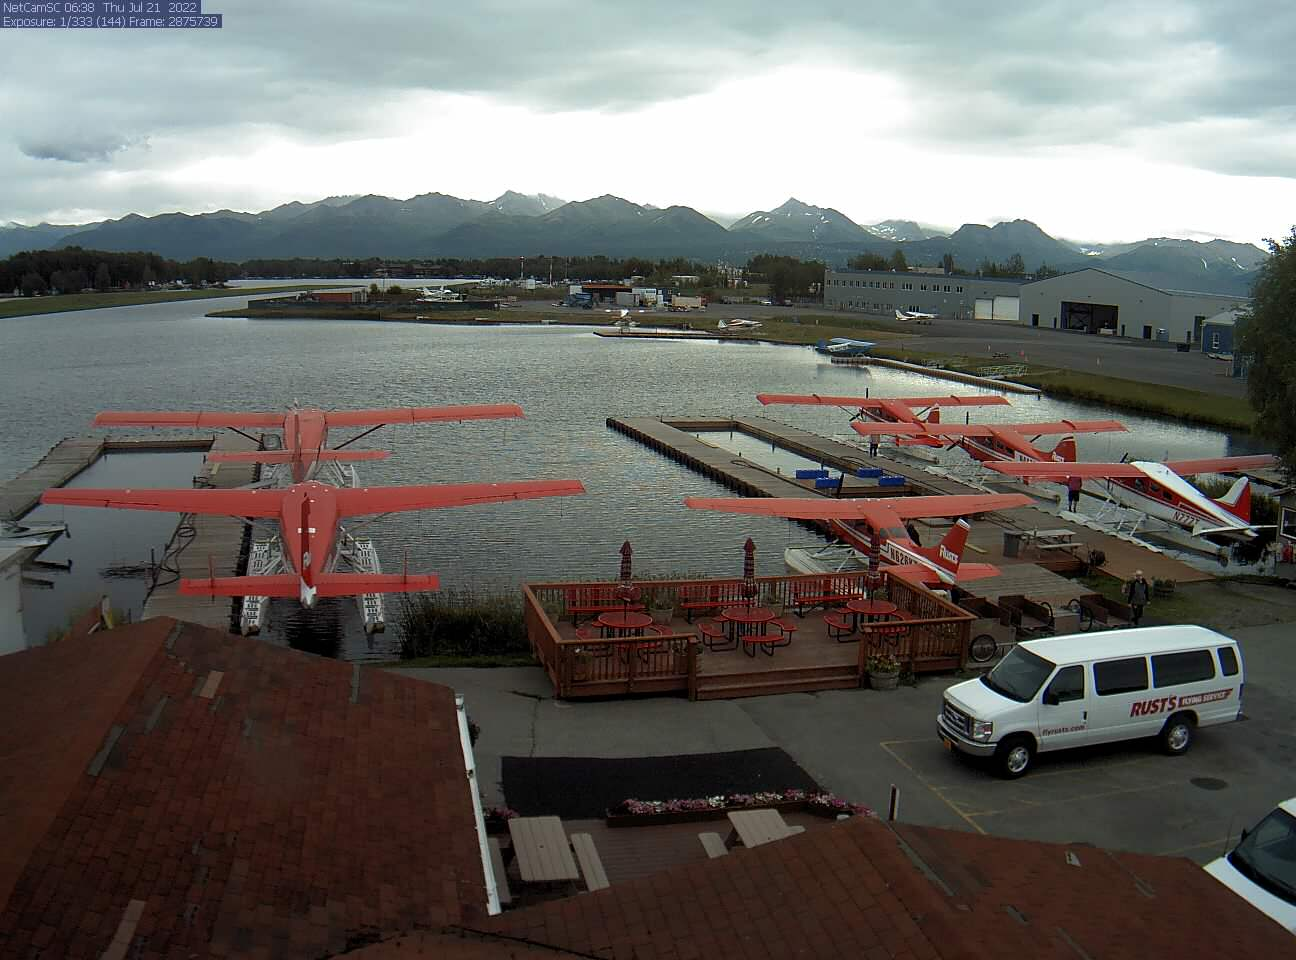 View of Rust's and Lake Hood